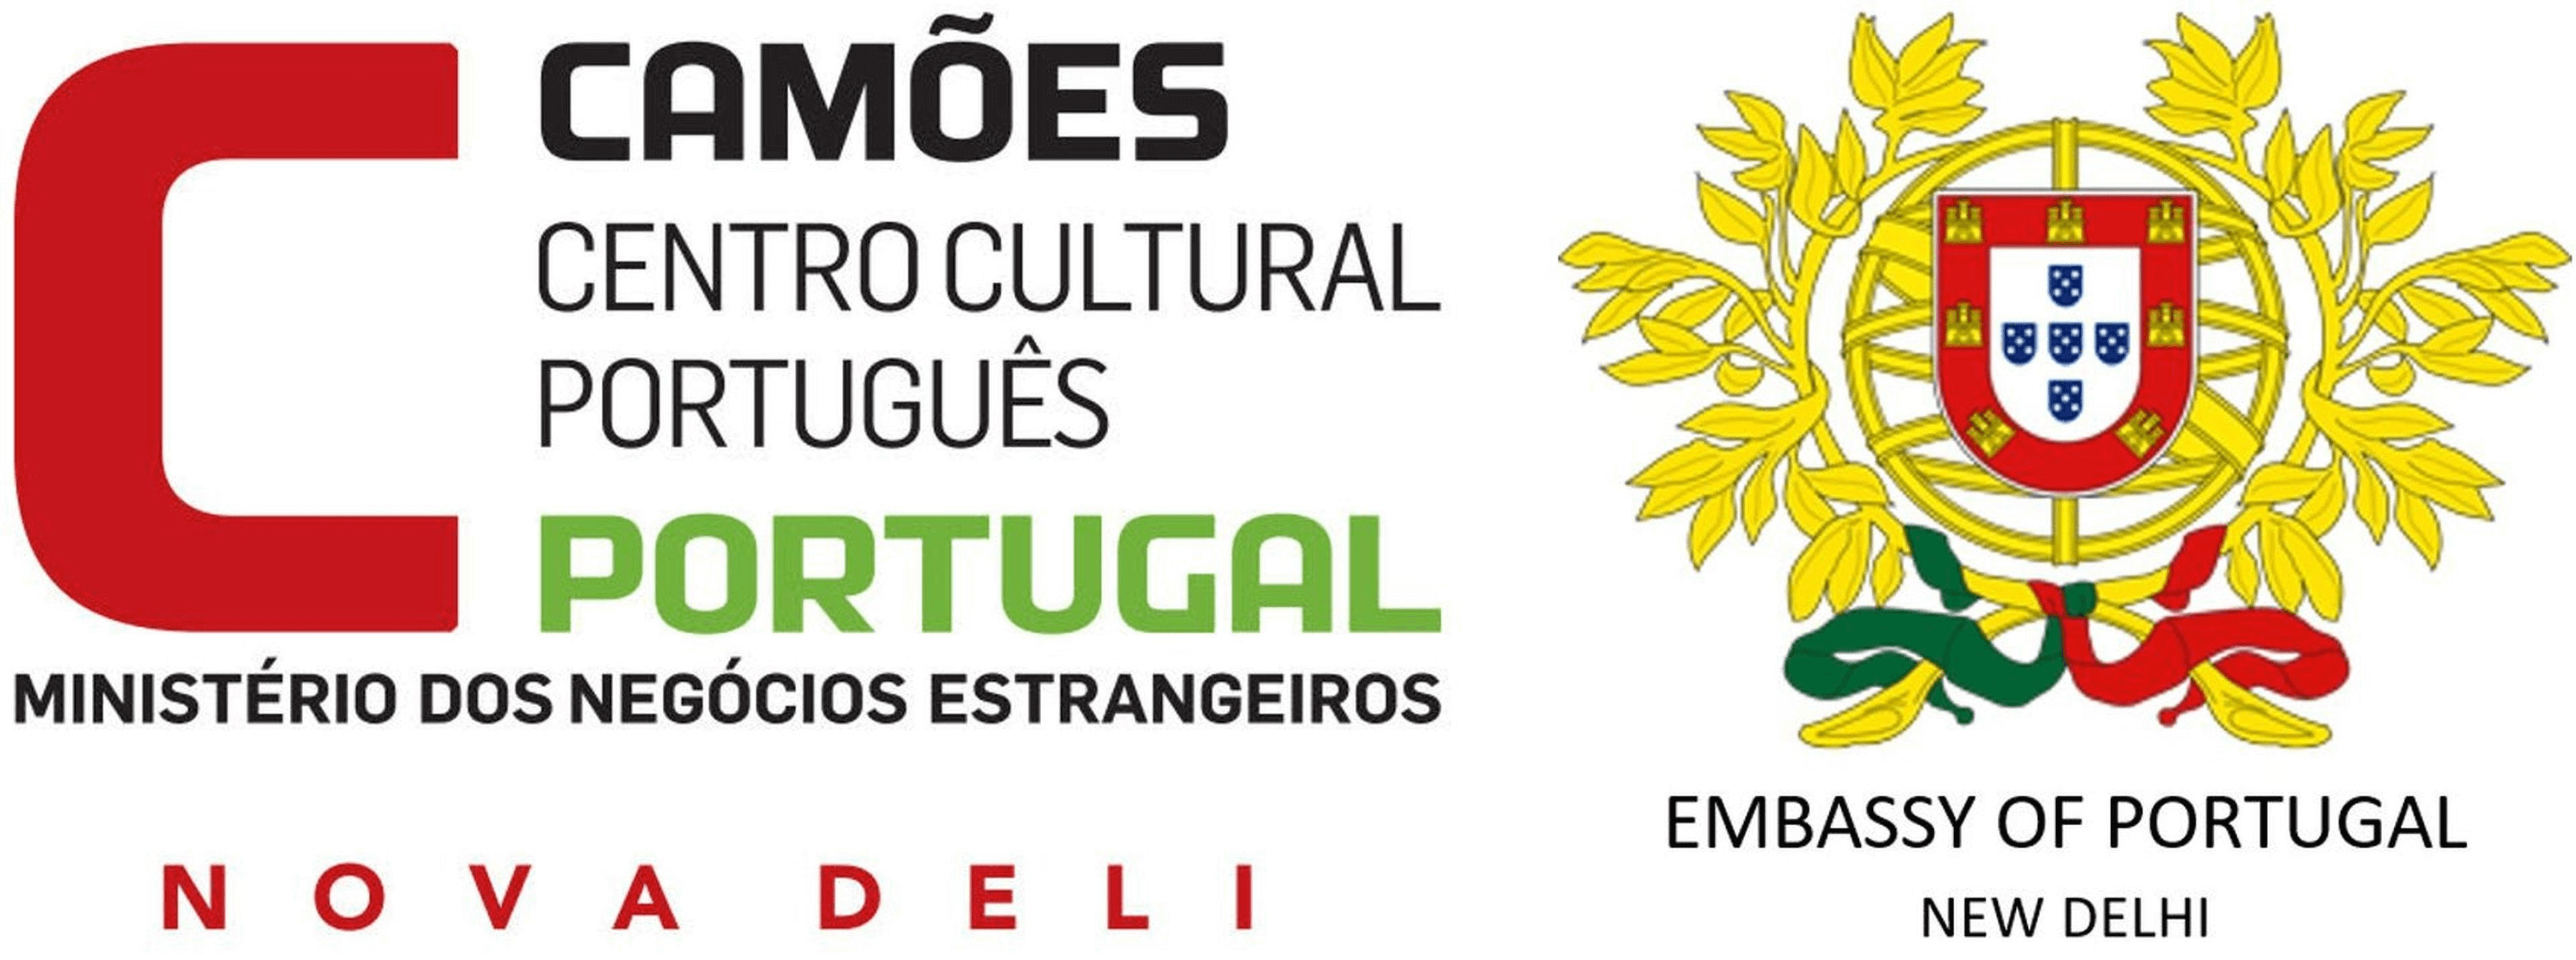 Camoes-Portuguese Embassy Cultural Centre (1)